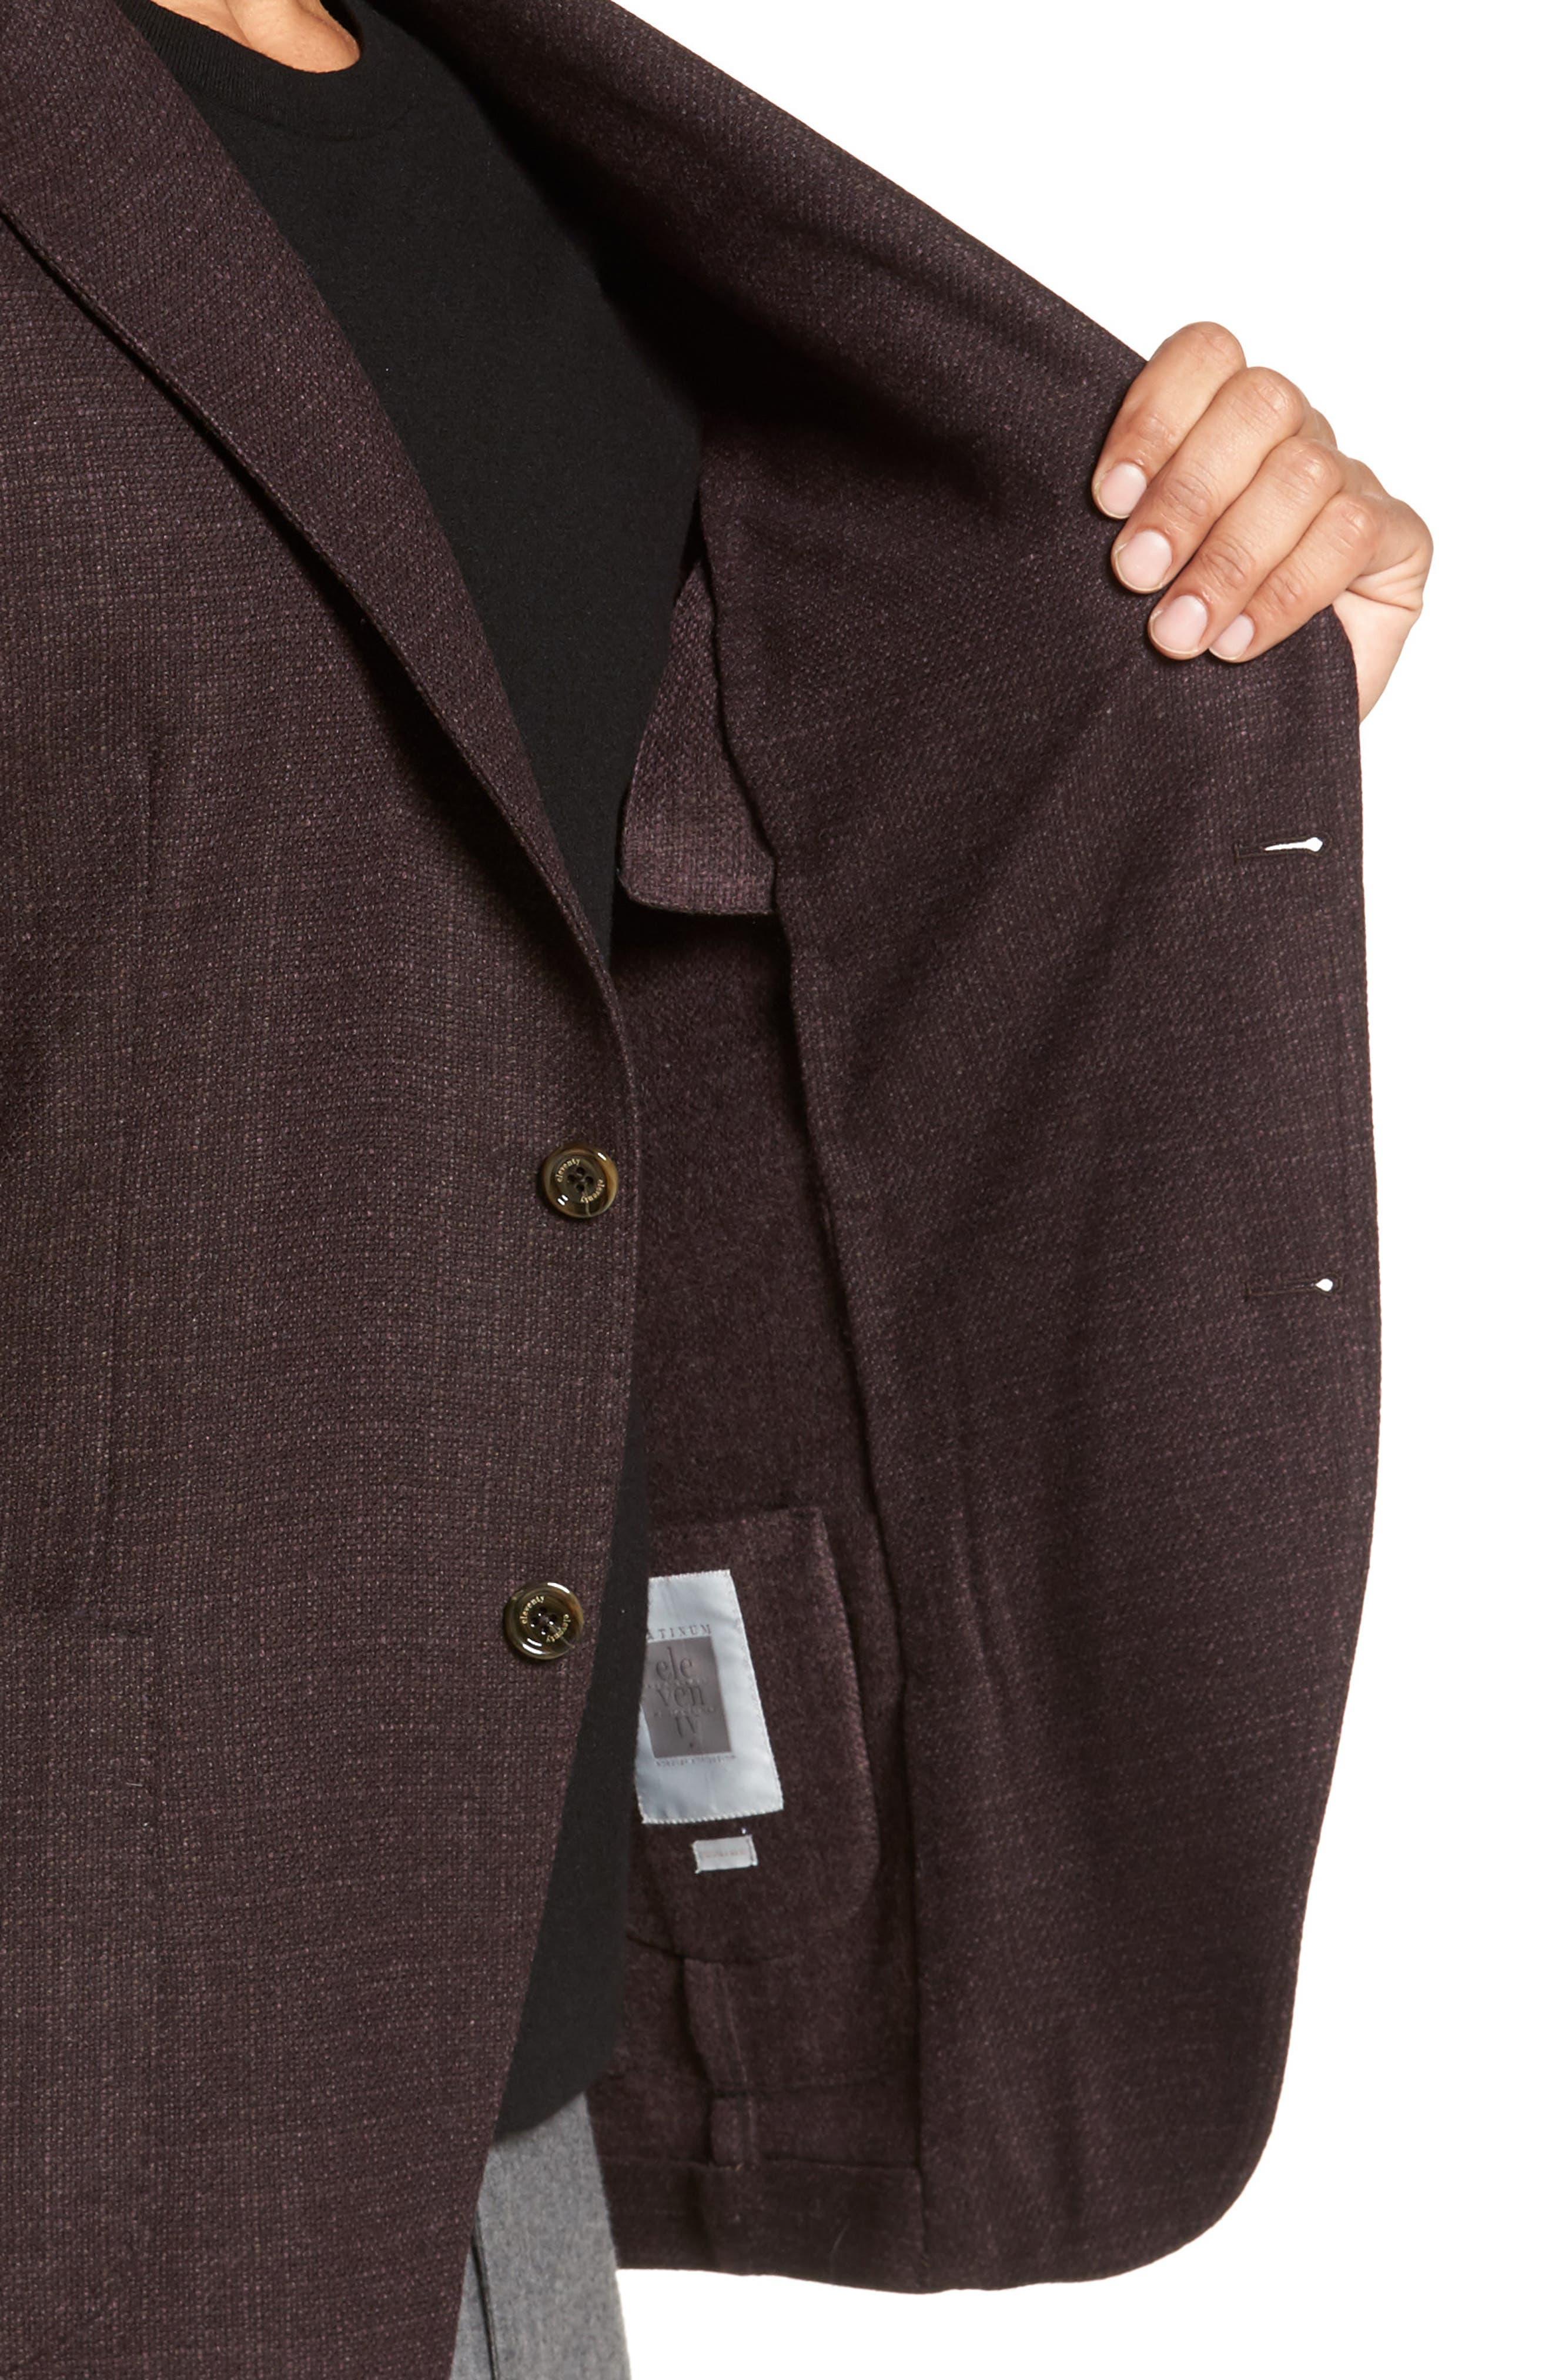 Trim Fit Wool & Cashmere Blazer,                             Alternate thumbnail 4, color,                             Wine